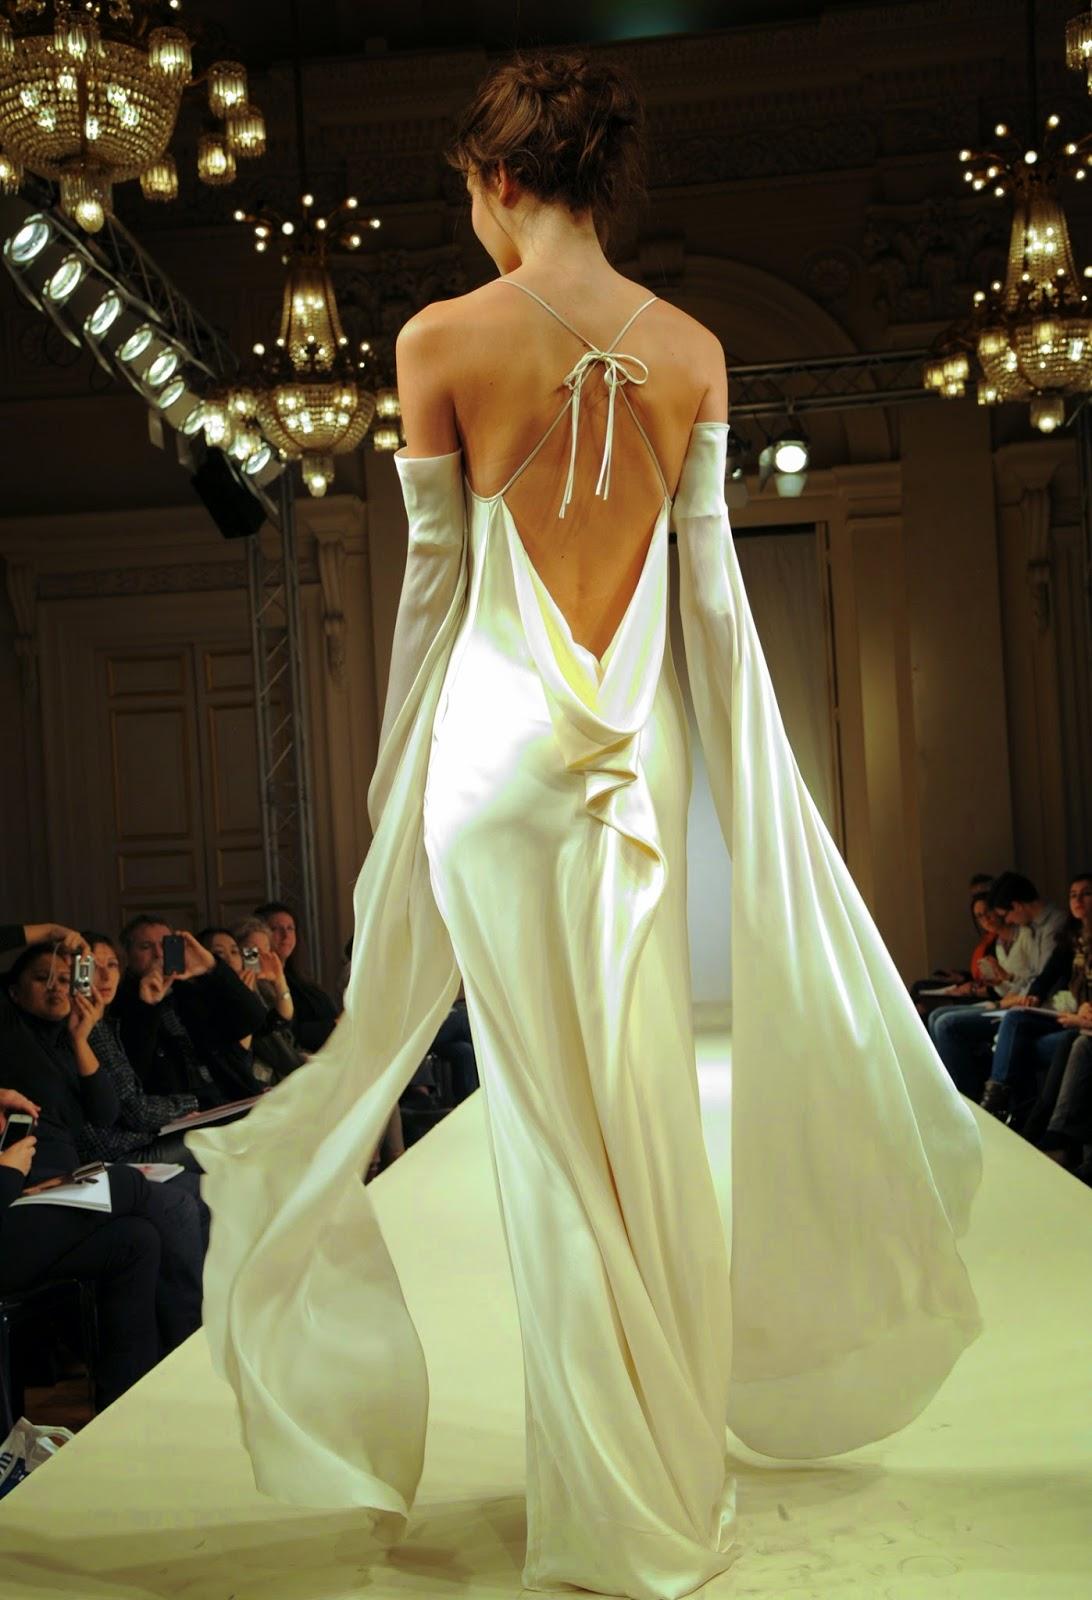 fanny liautard cr atrice de mode robes de mari e soir e tailleur et smoking soir et. Black Bedroom Furniture Sets. Home Design Ideas